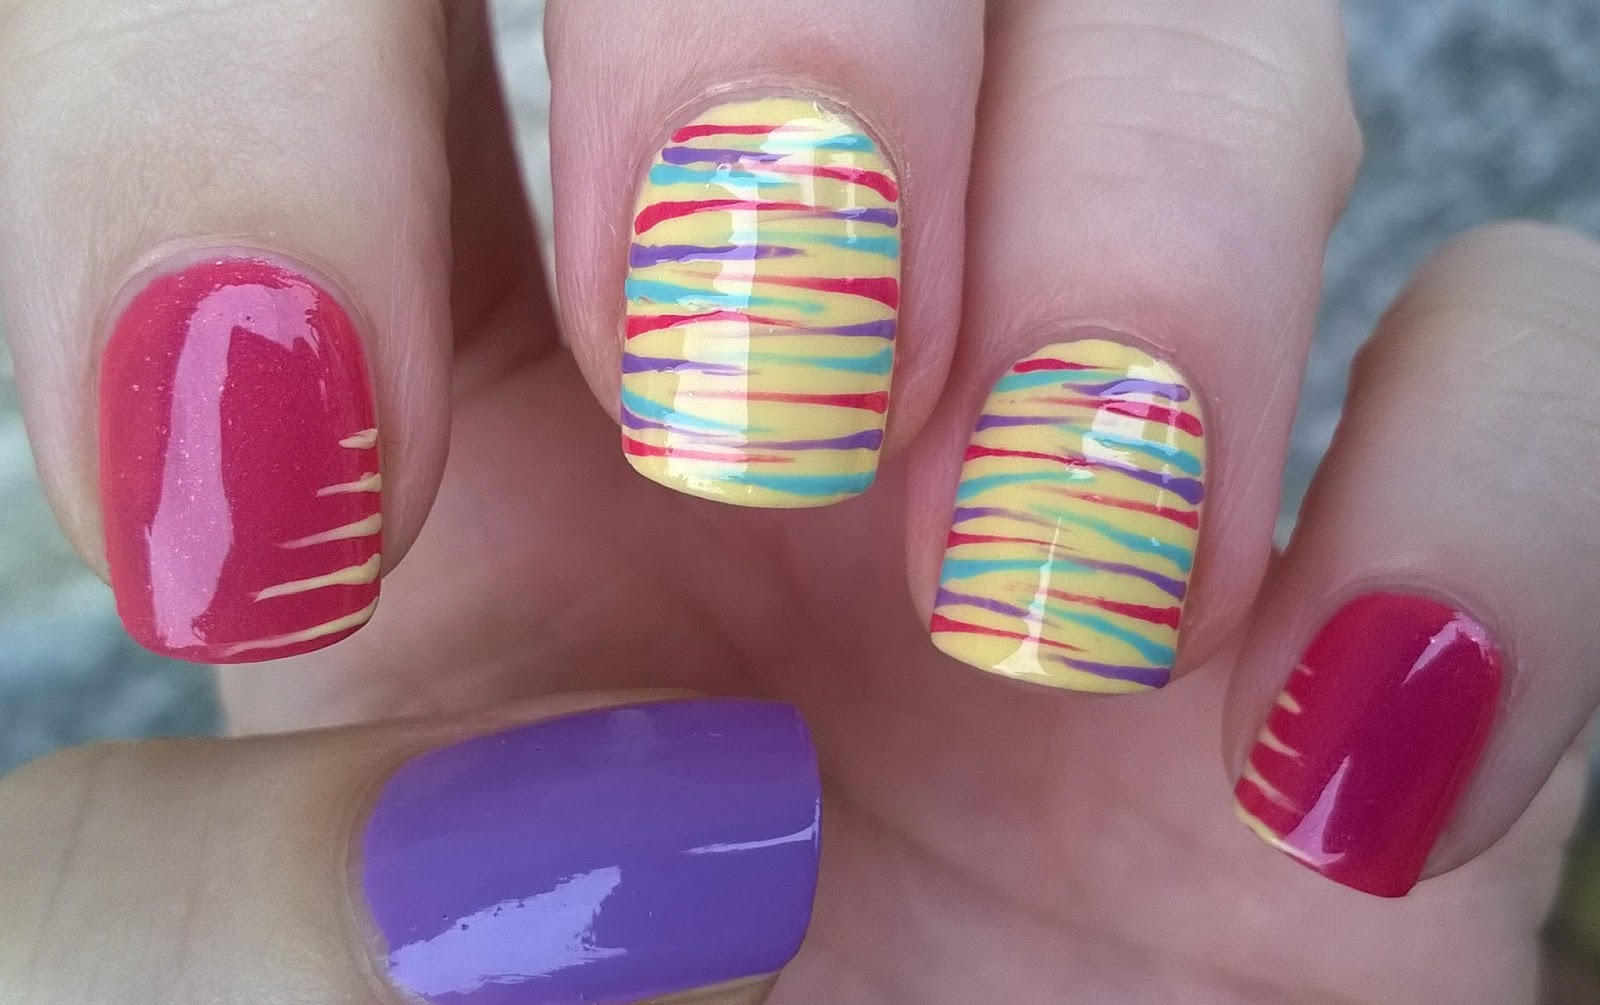 Life World Women Striping Brush Nail Art Stripes In Pink Yellow